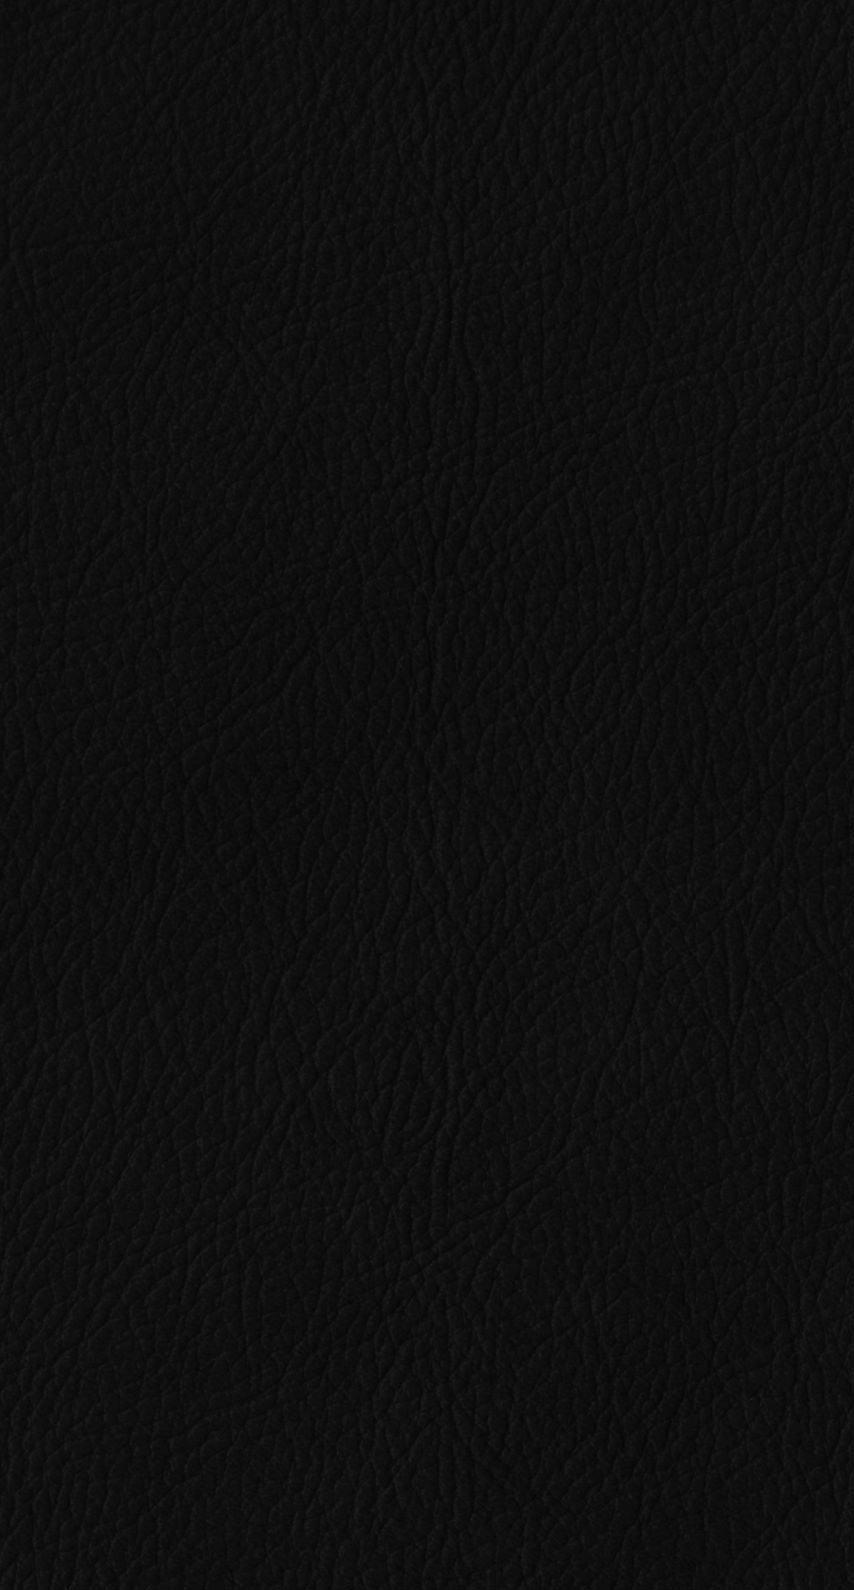 Black Wallpaper Sc Iphone7